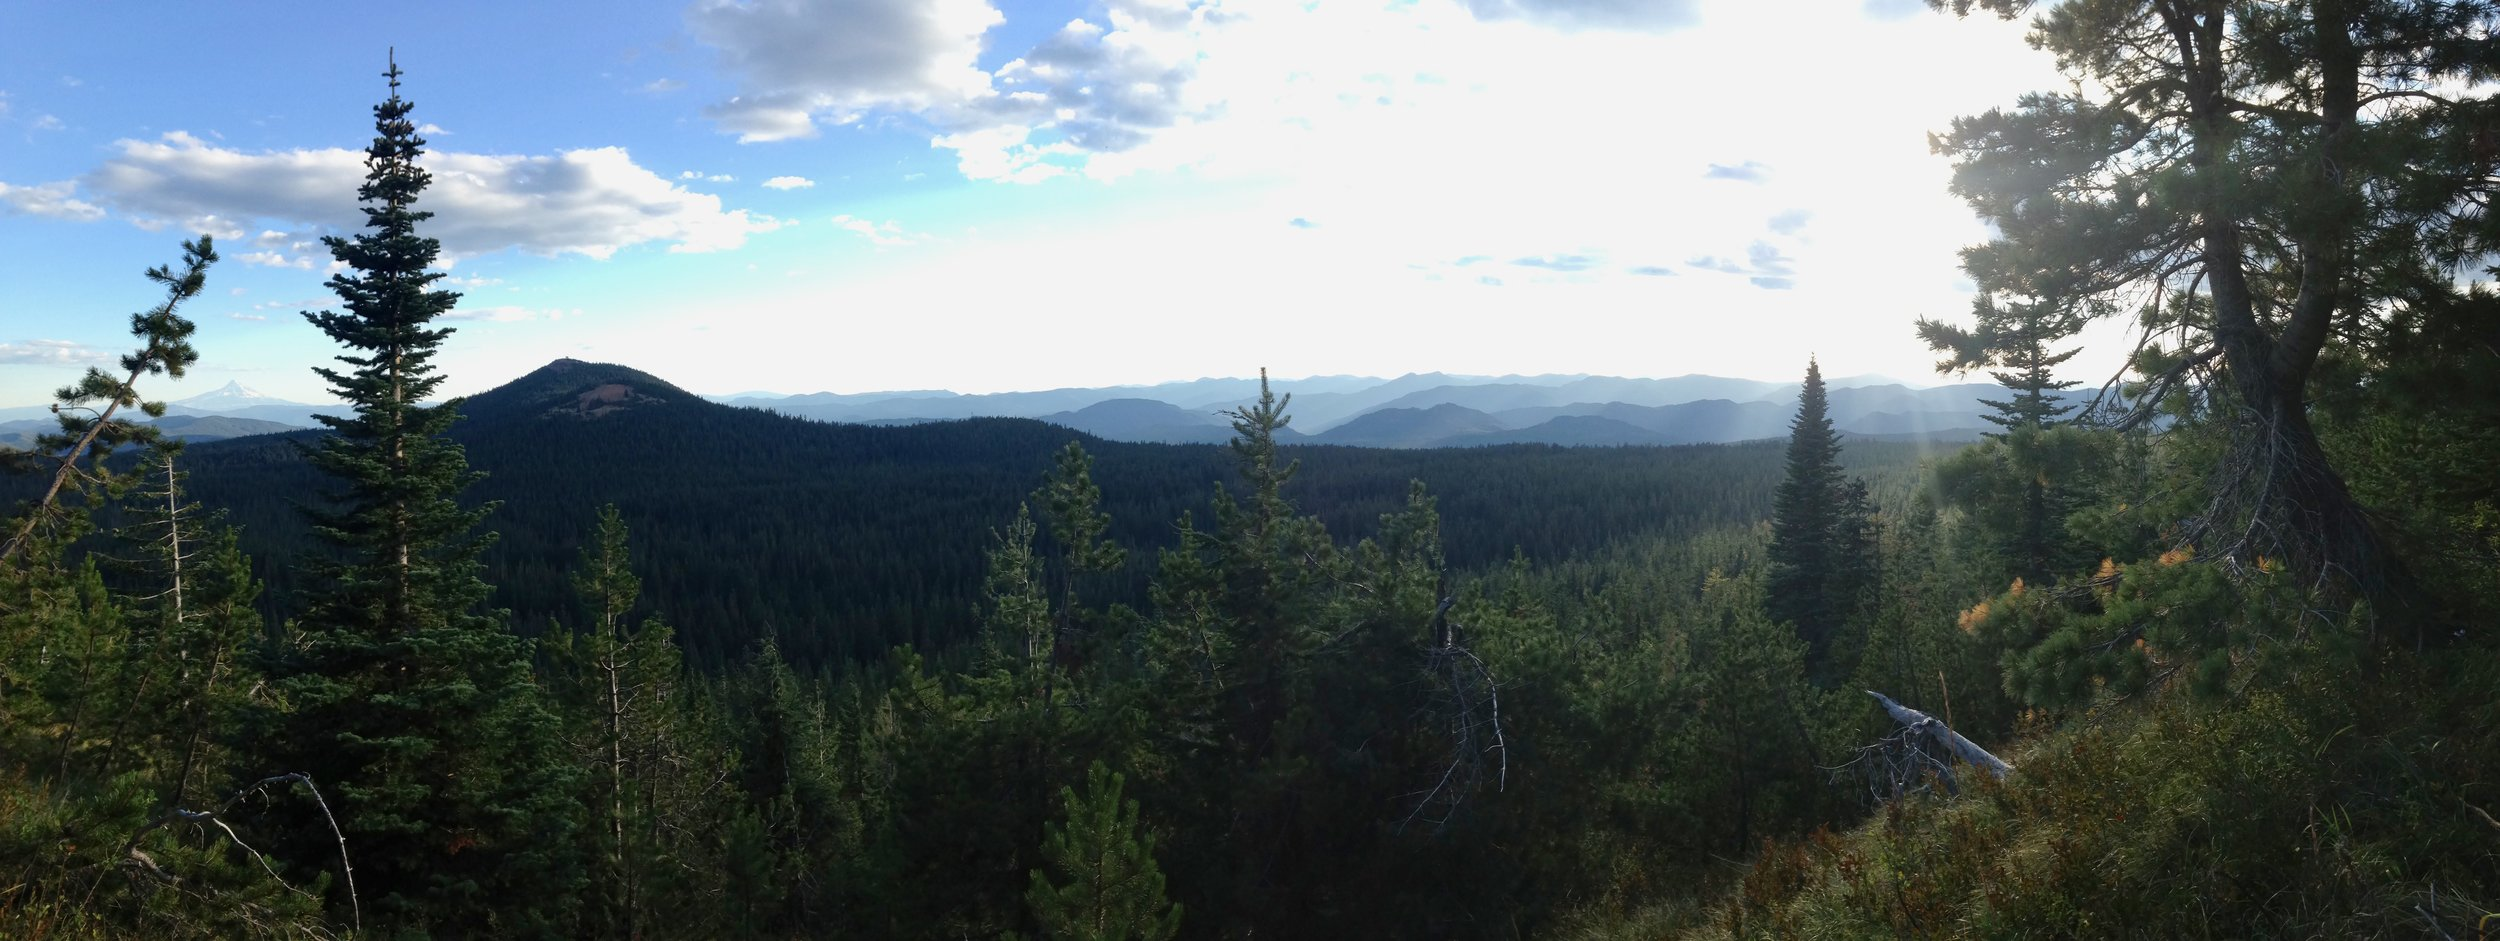 Gifford Pinchot National Forest, WA